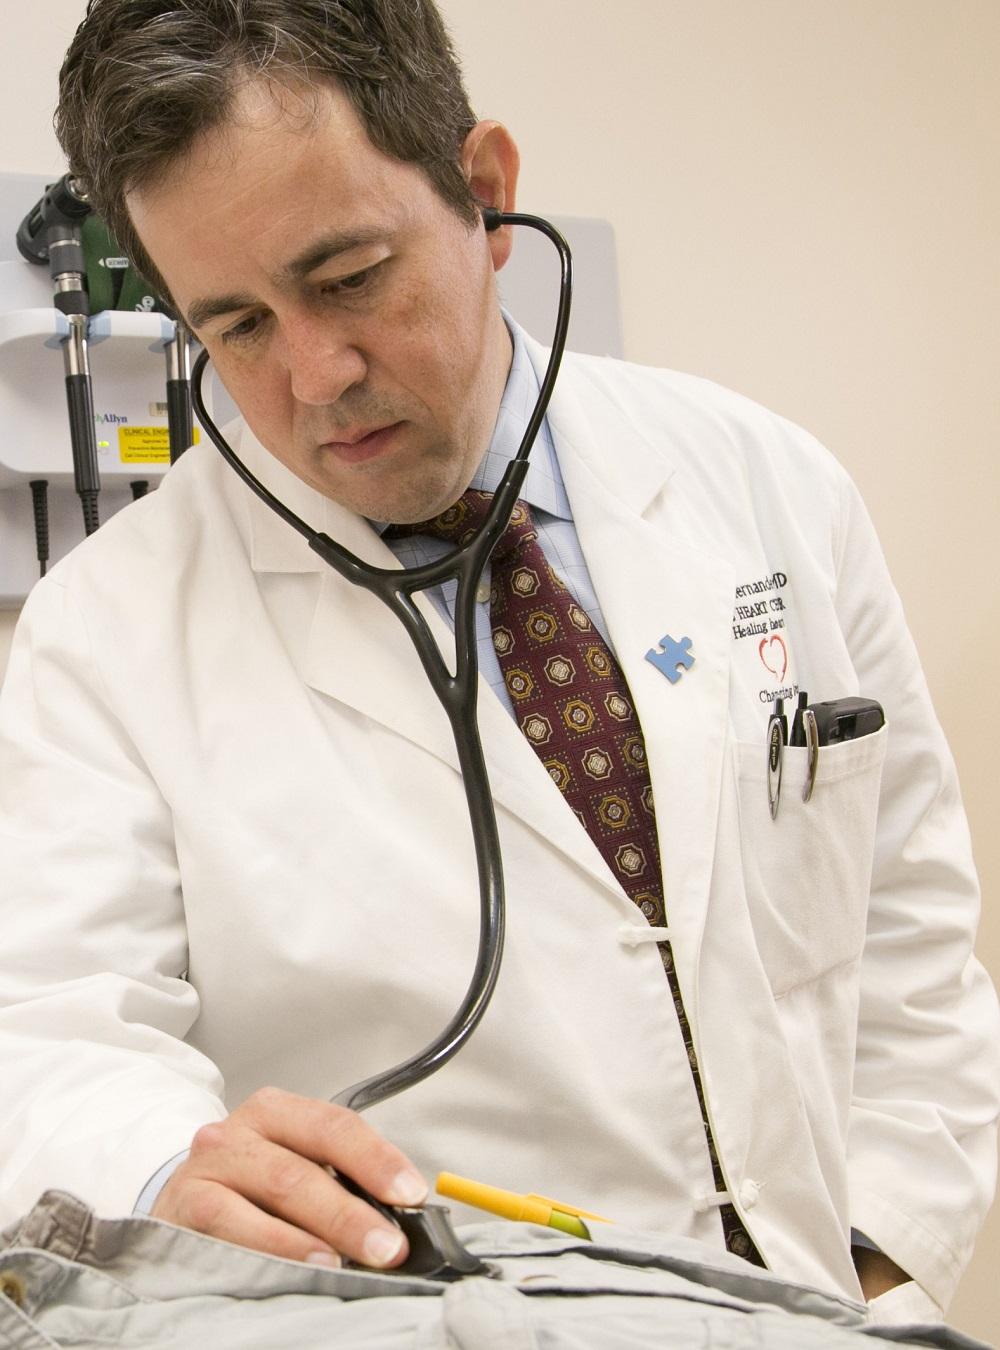 Dr. Adrian Hernandez attending to a patient. (PROSPER narrative)